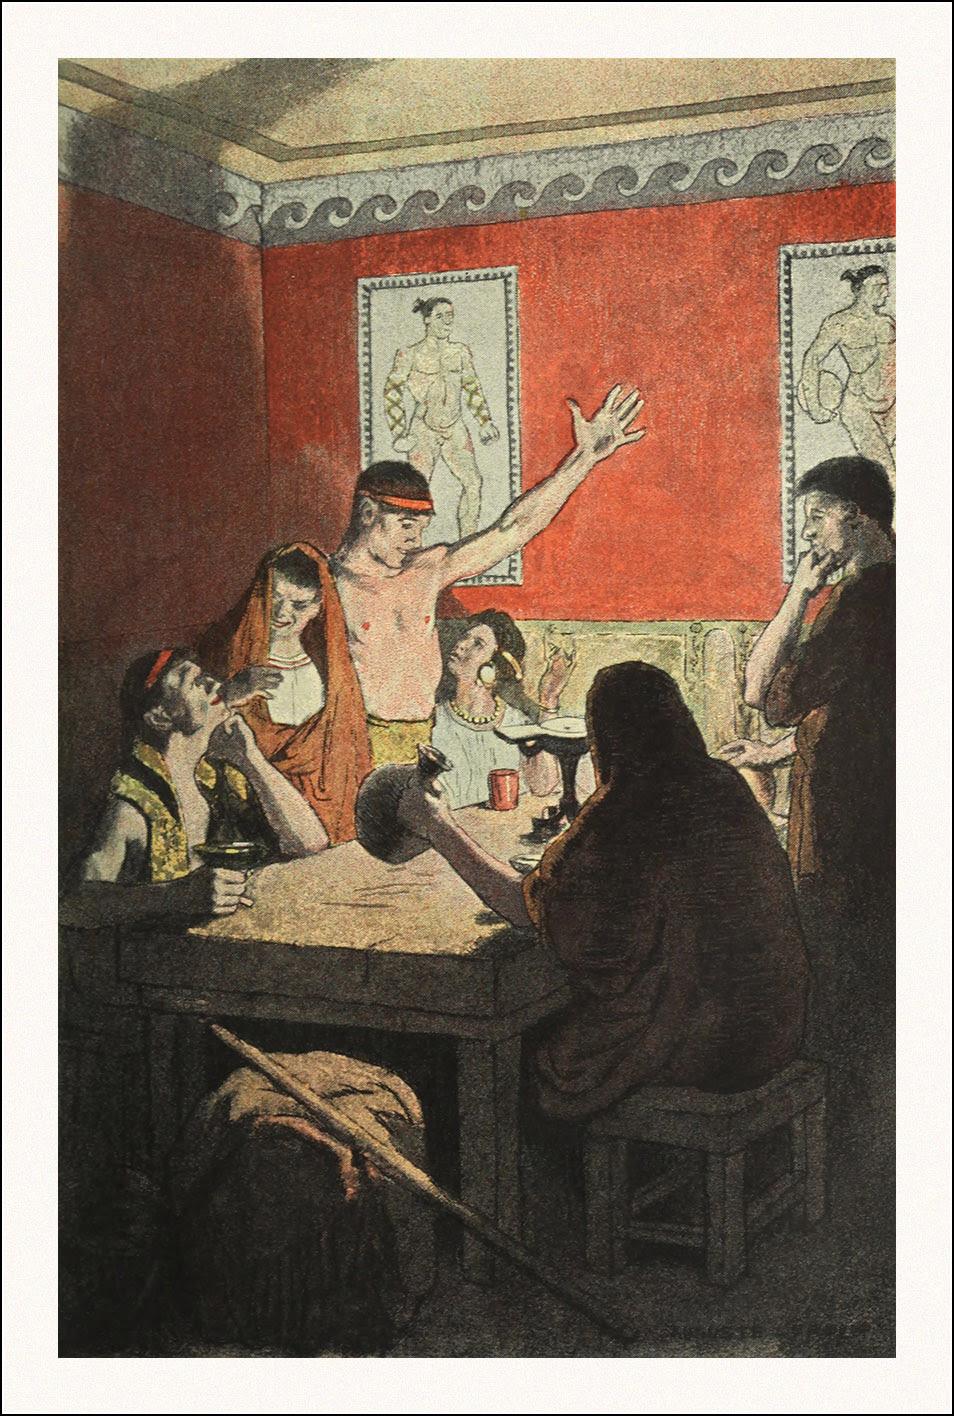 L'orgie latine, Auguste Leroux